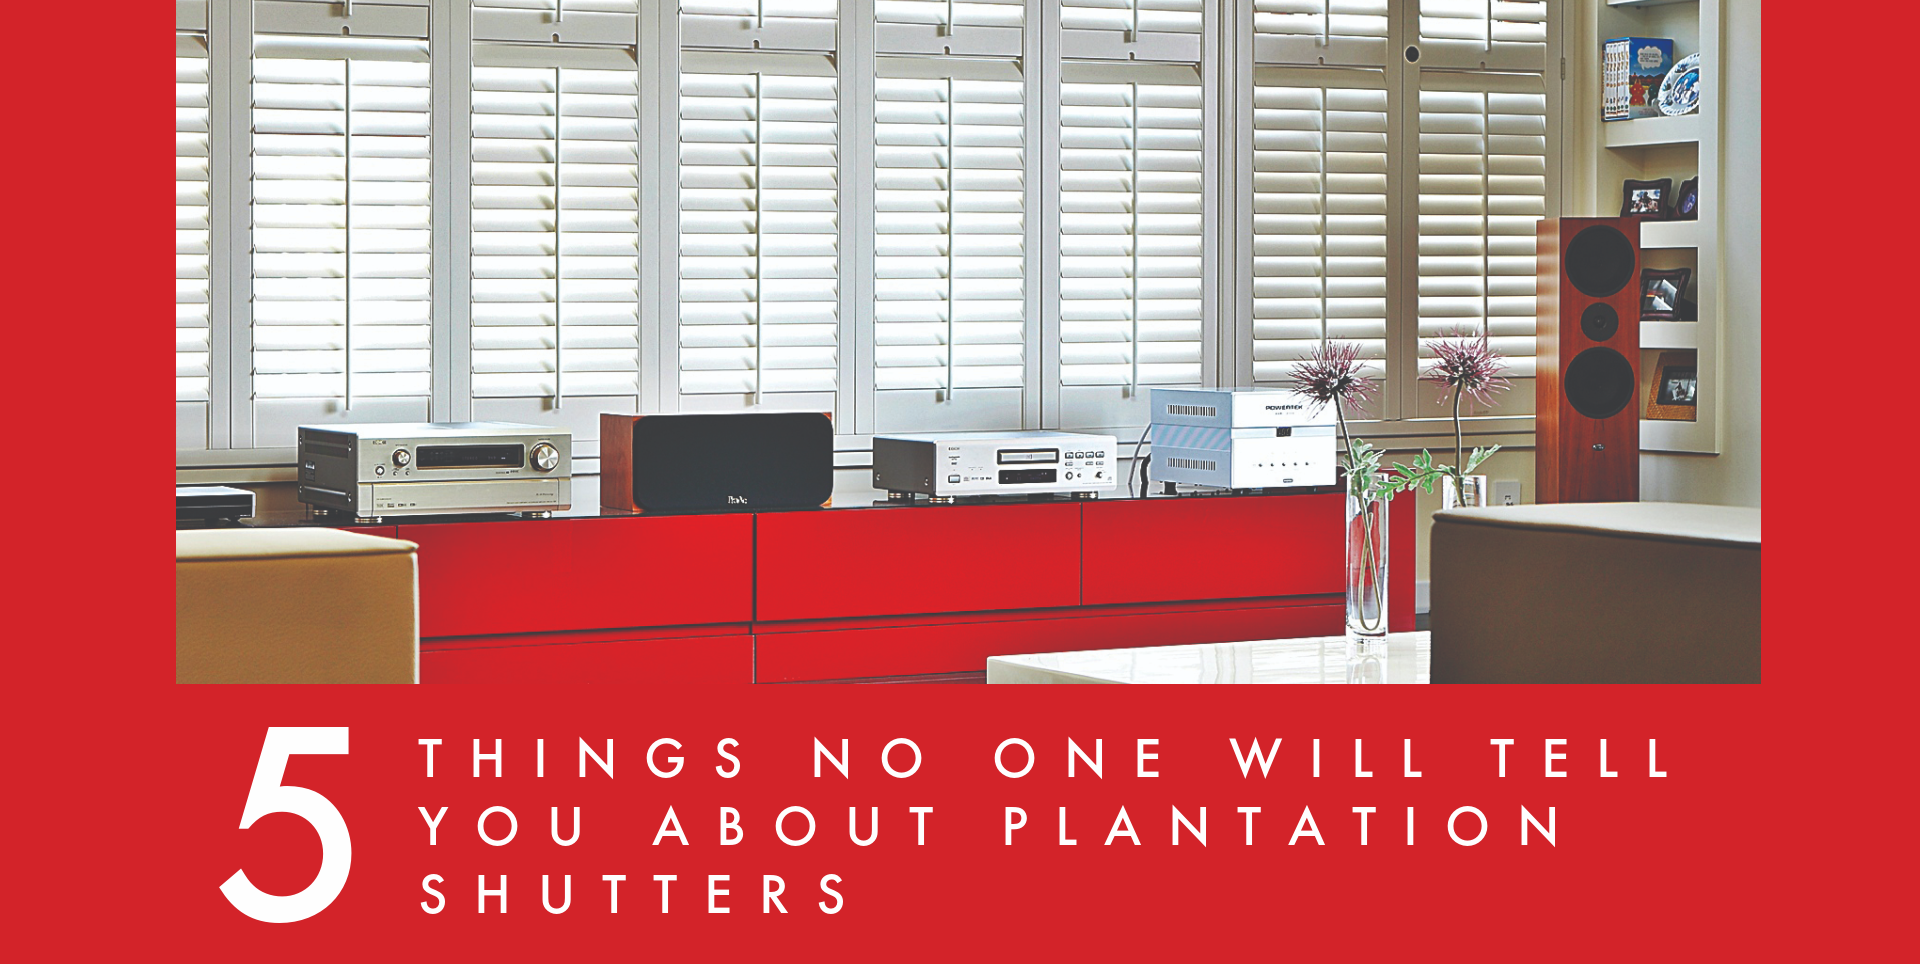 Plantation Shutters in red interior design listicle promo